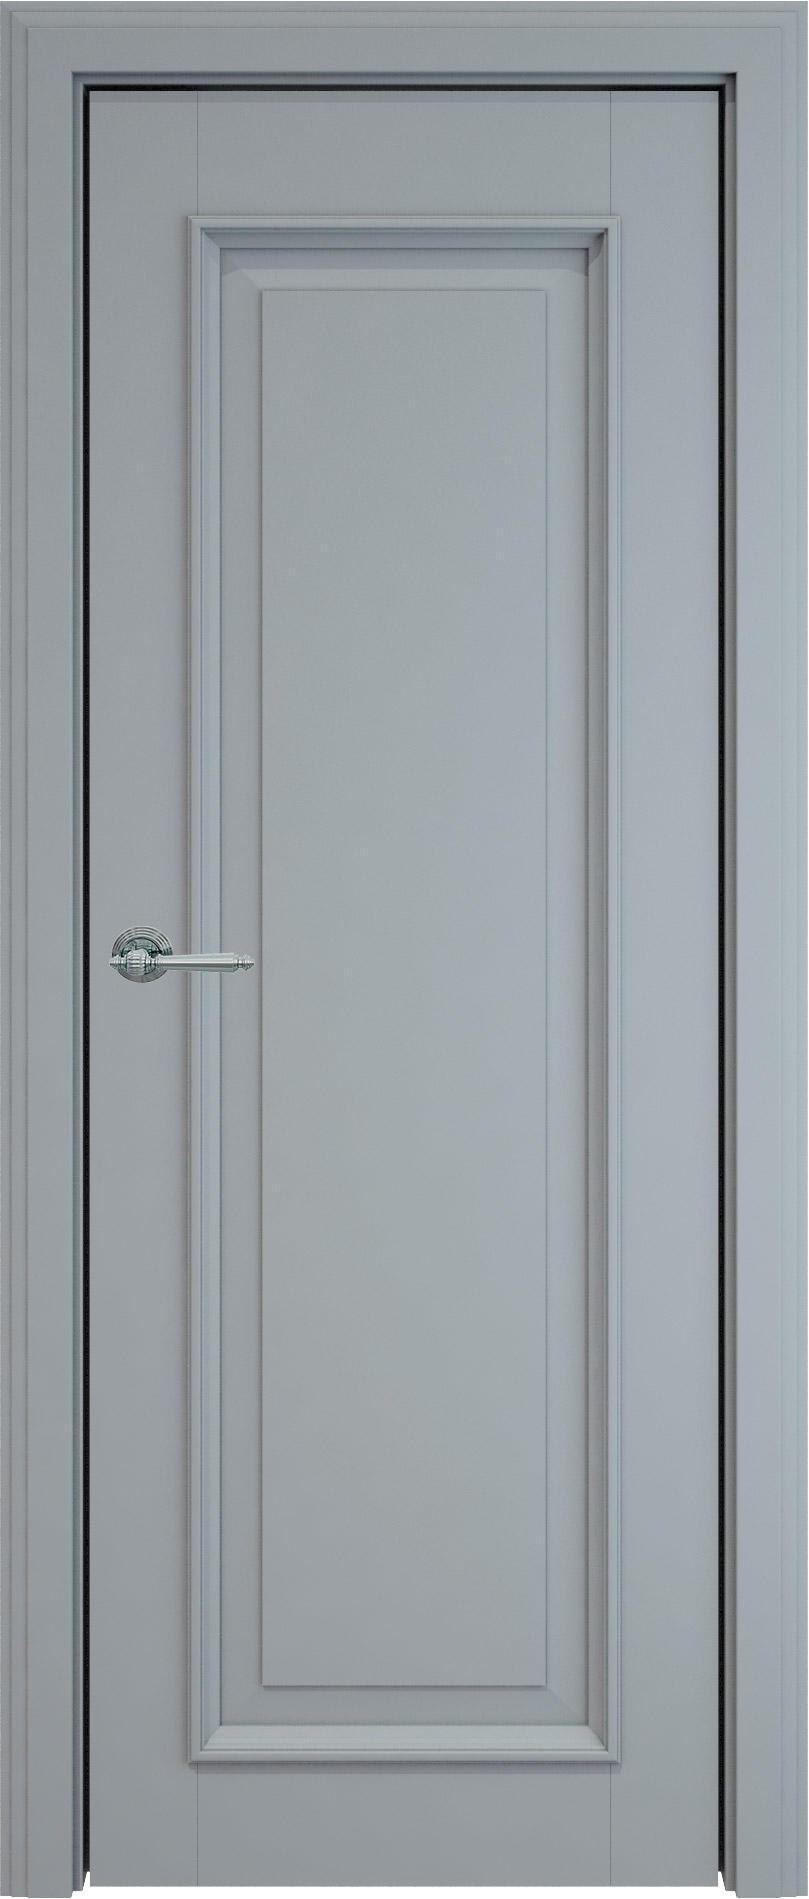 Domenica LUX цвет - Серебристо-серая эмаль (RAL 7045) Без стекла (ДГ)